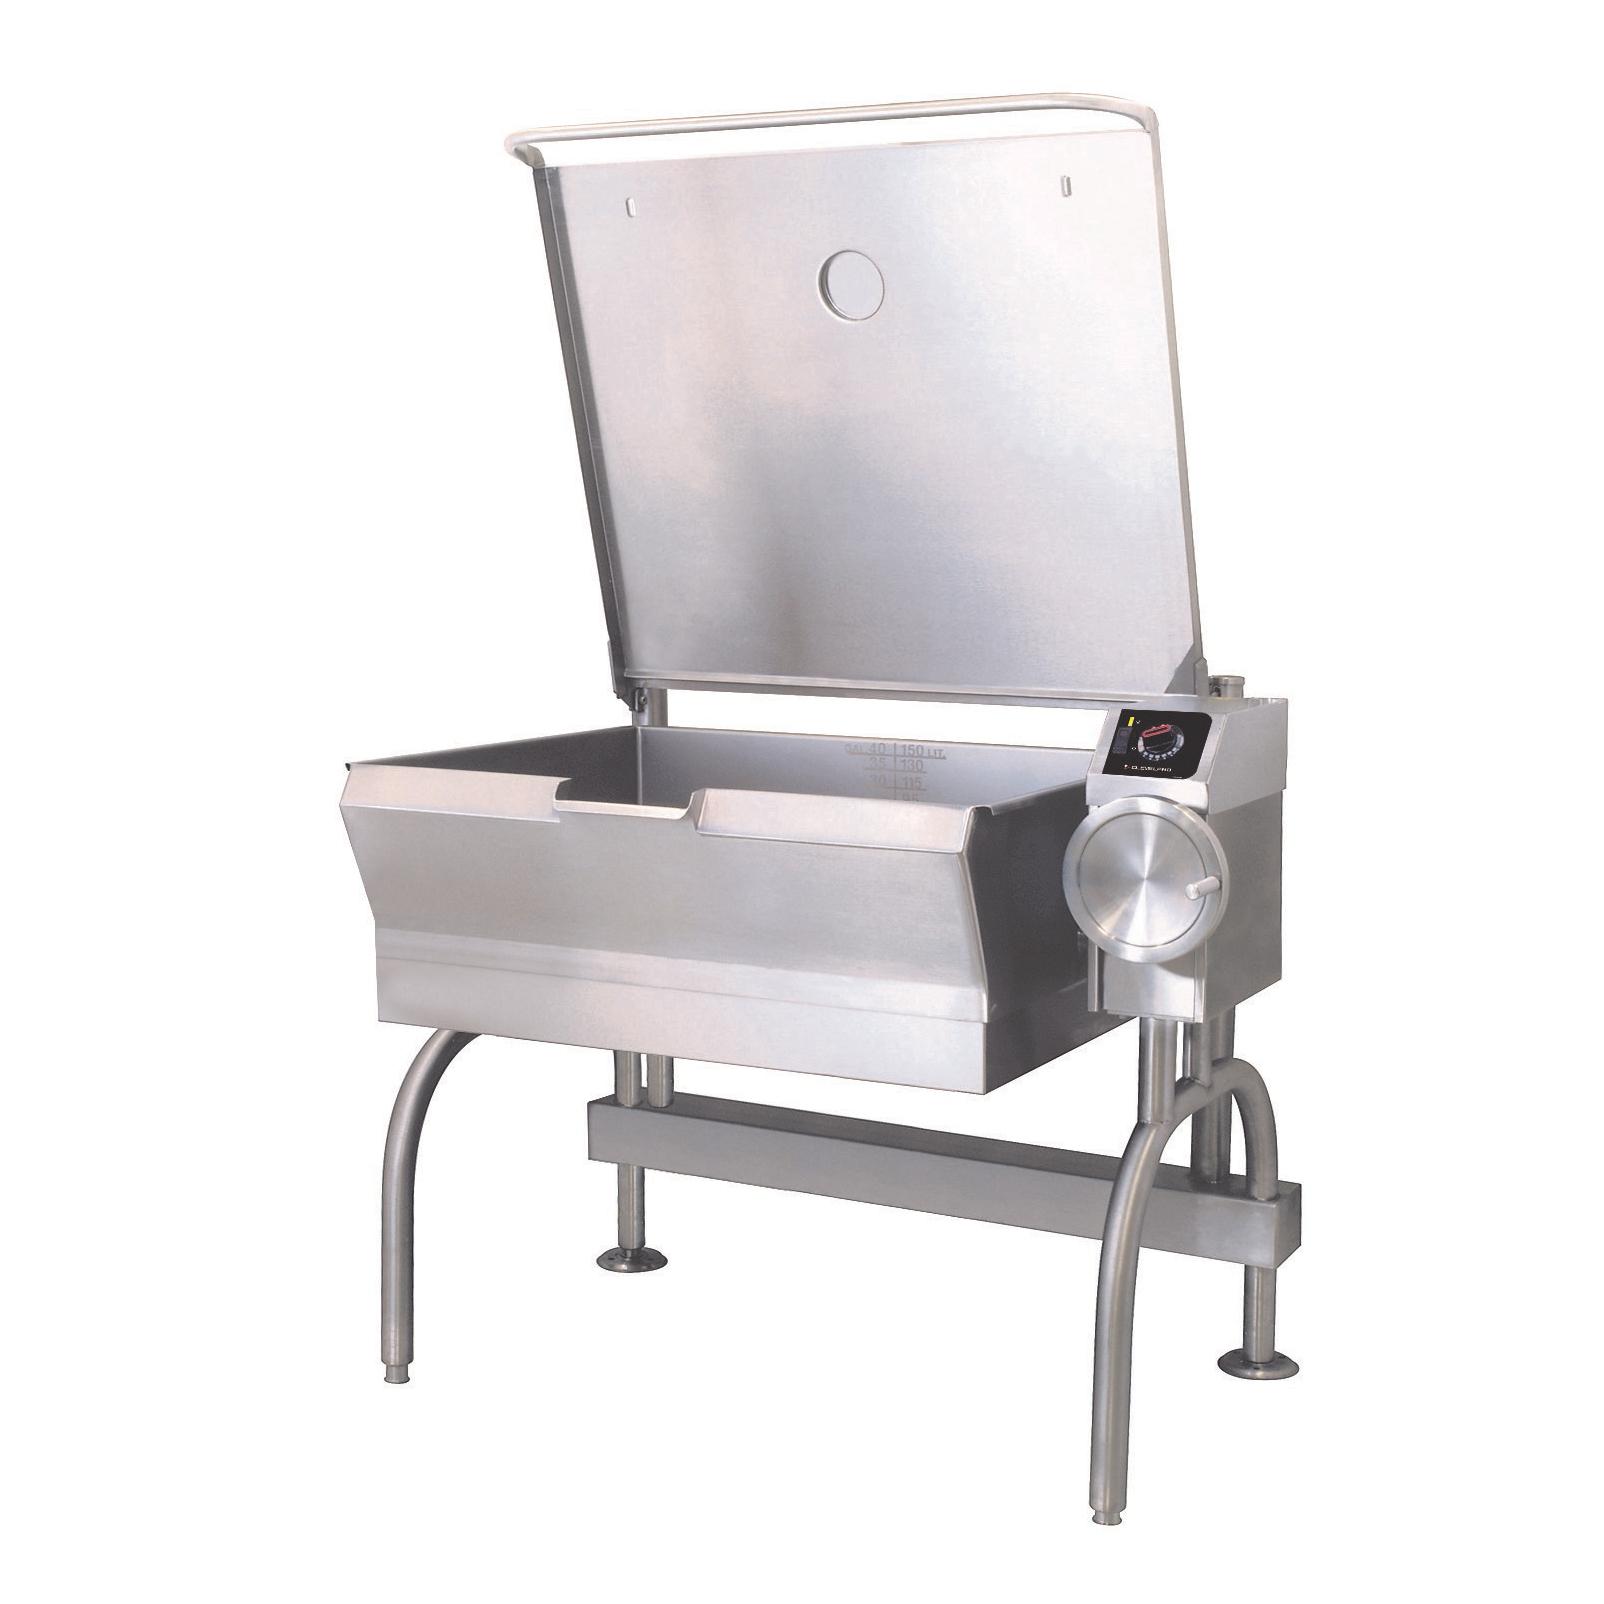 Cleveland Range SEL40T1 tilting skillet braising pan, electric